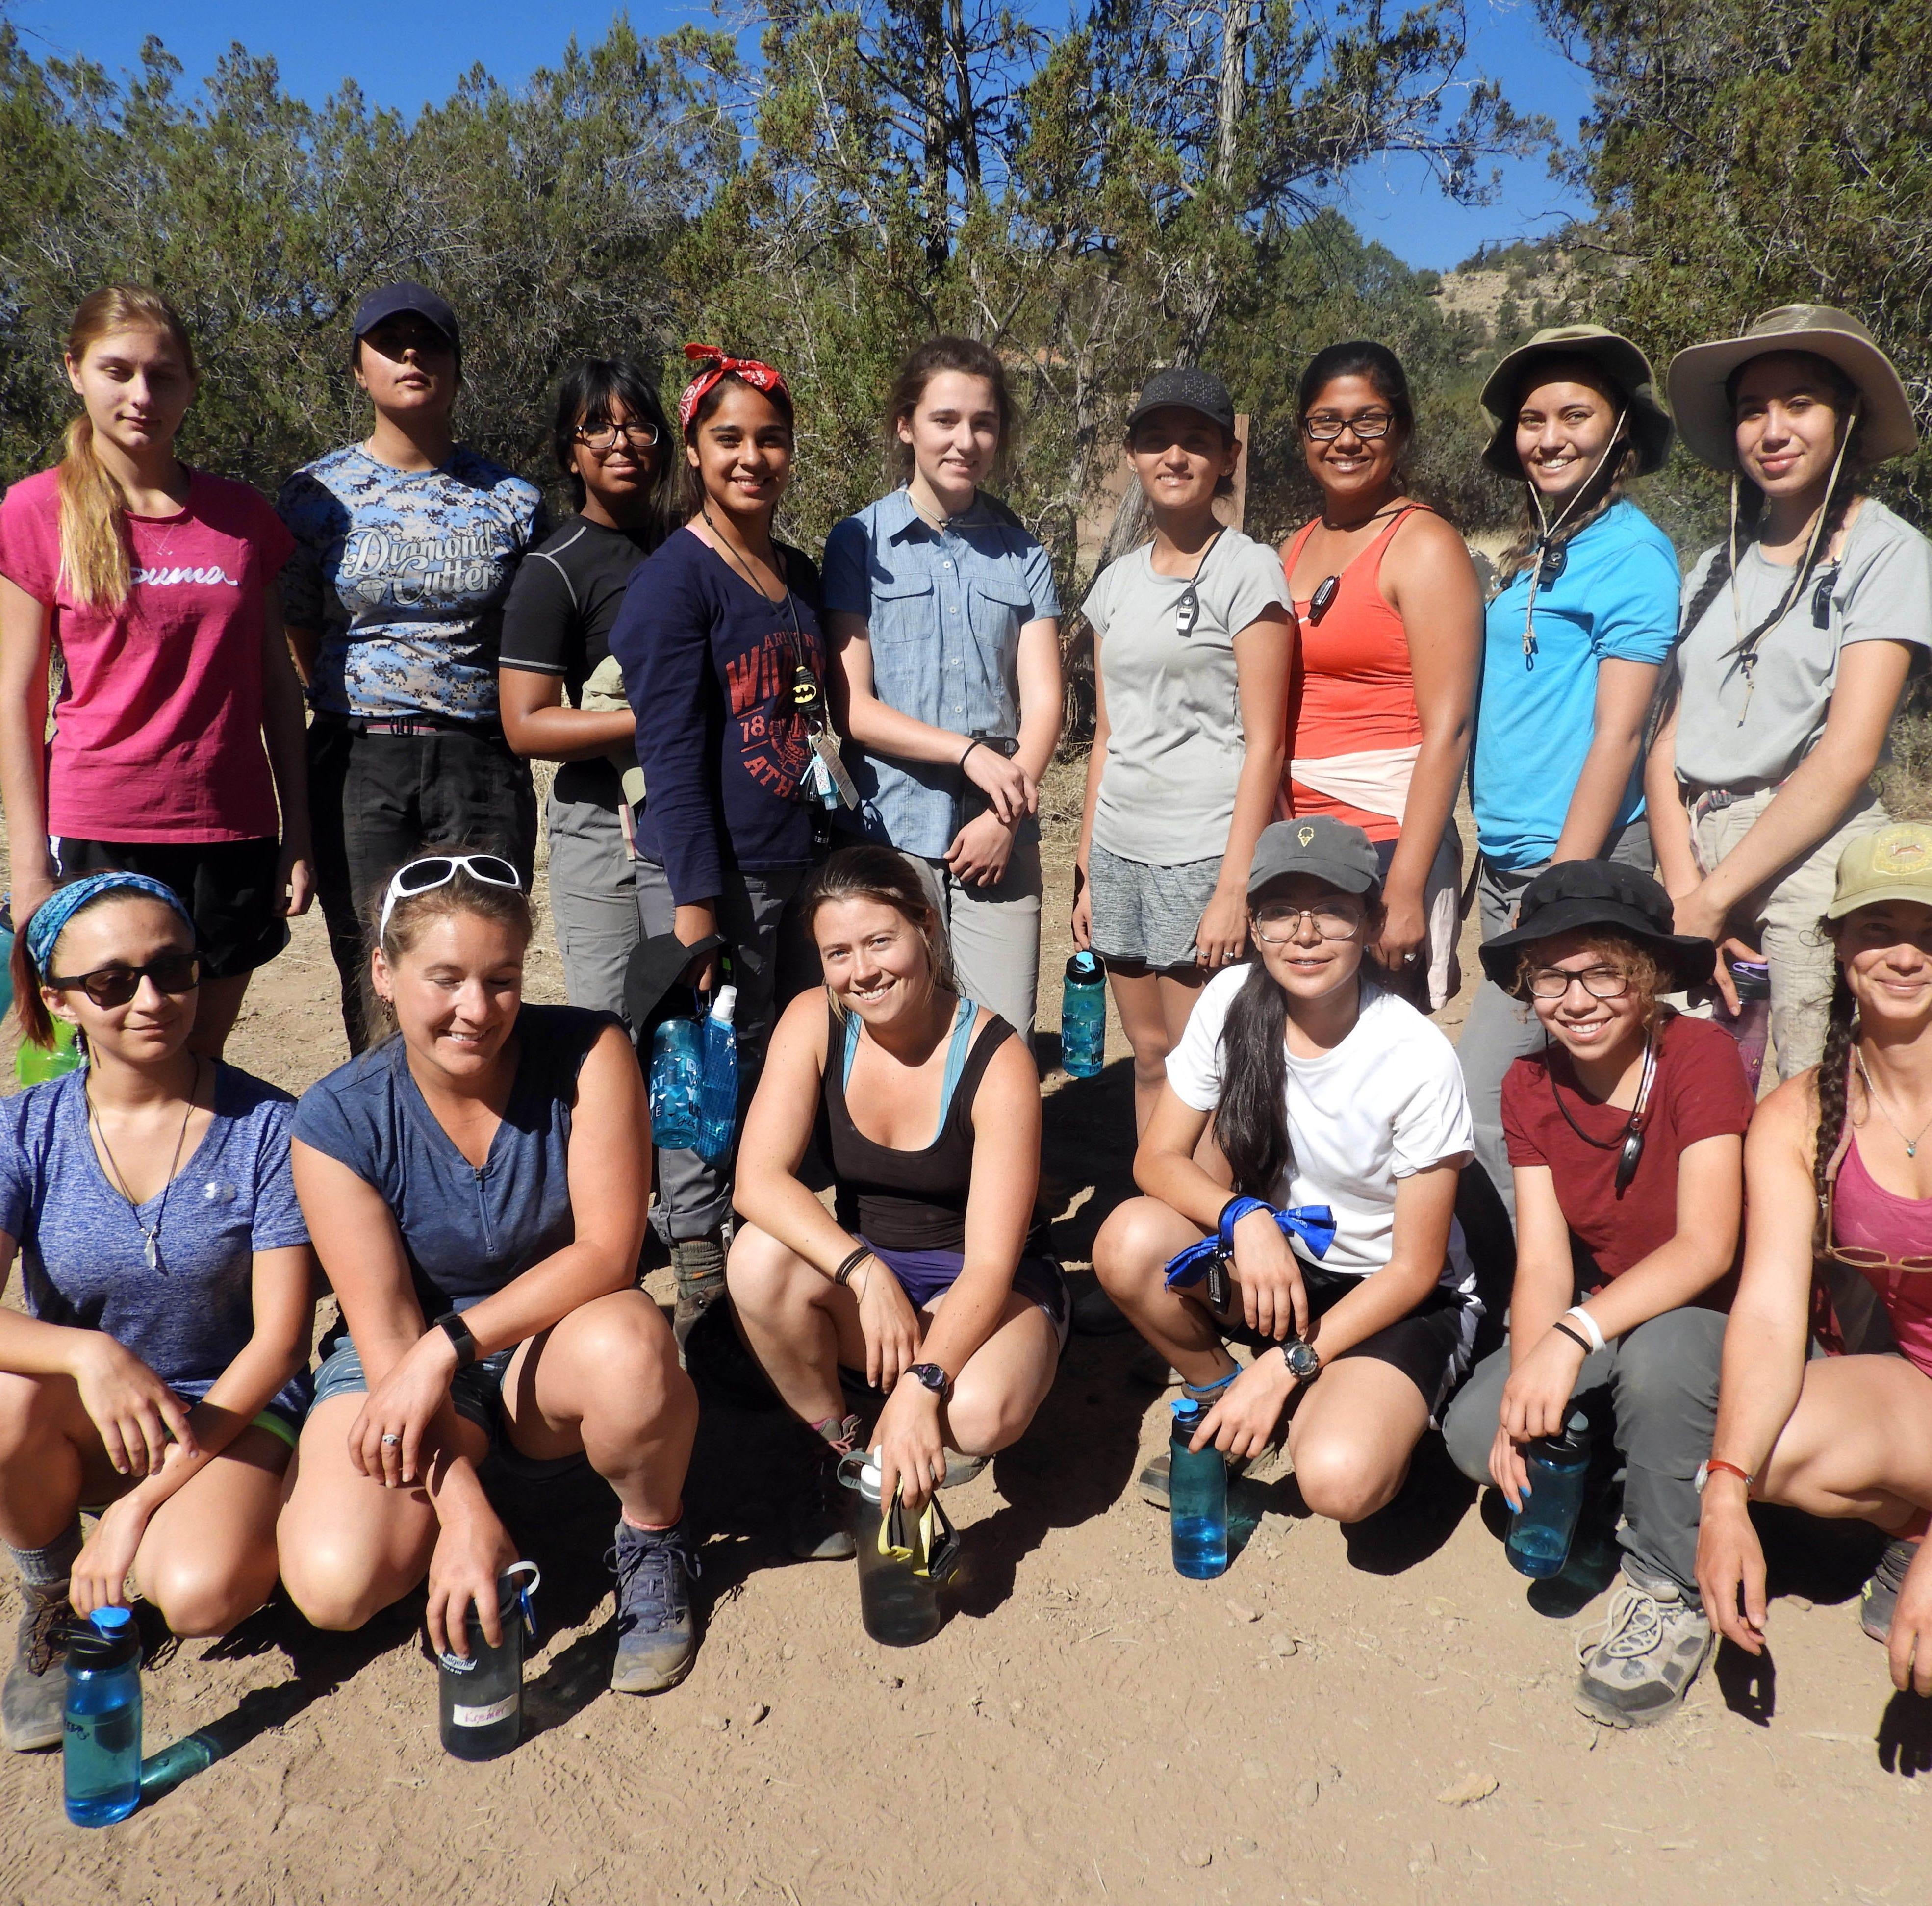 NMSU GALS program empowered teenage girls through backpacking trip